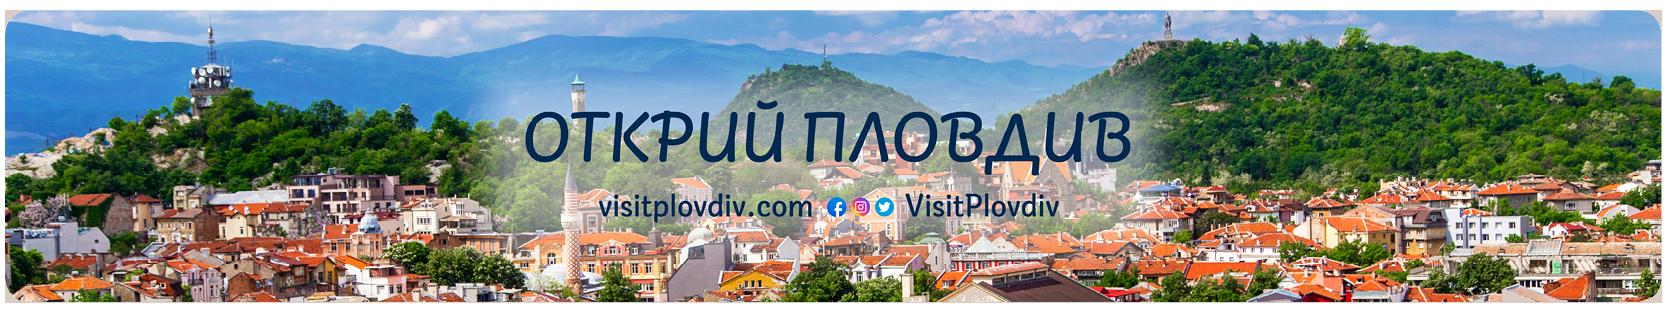 Visit Plovdiv Banner